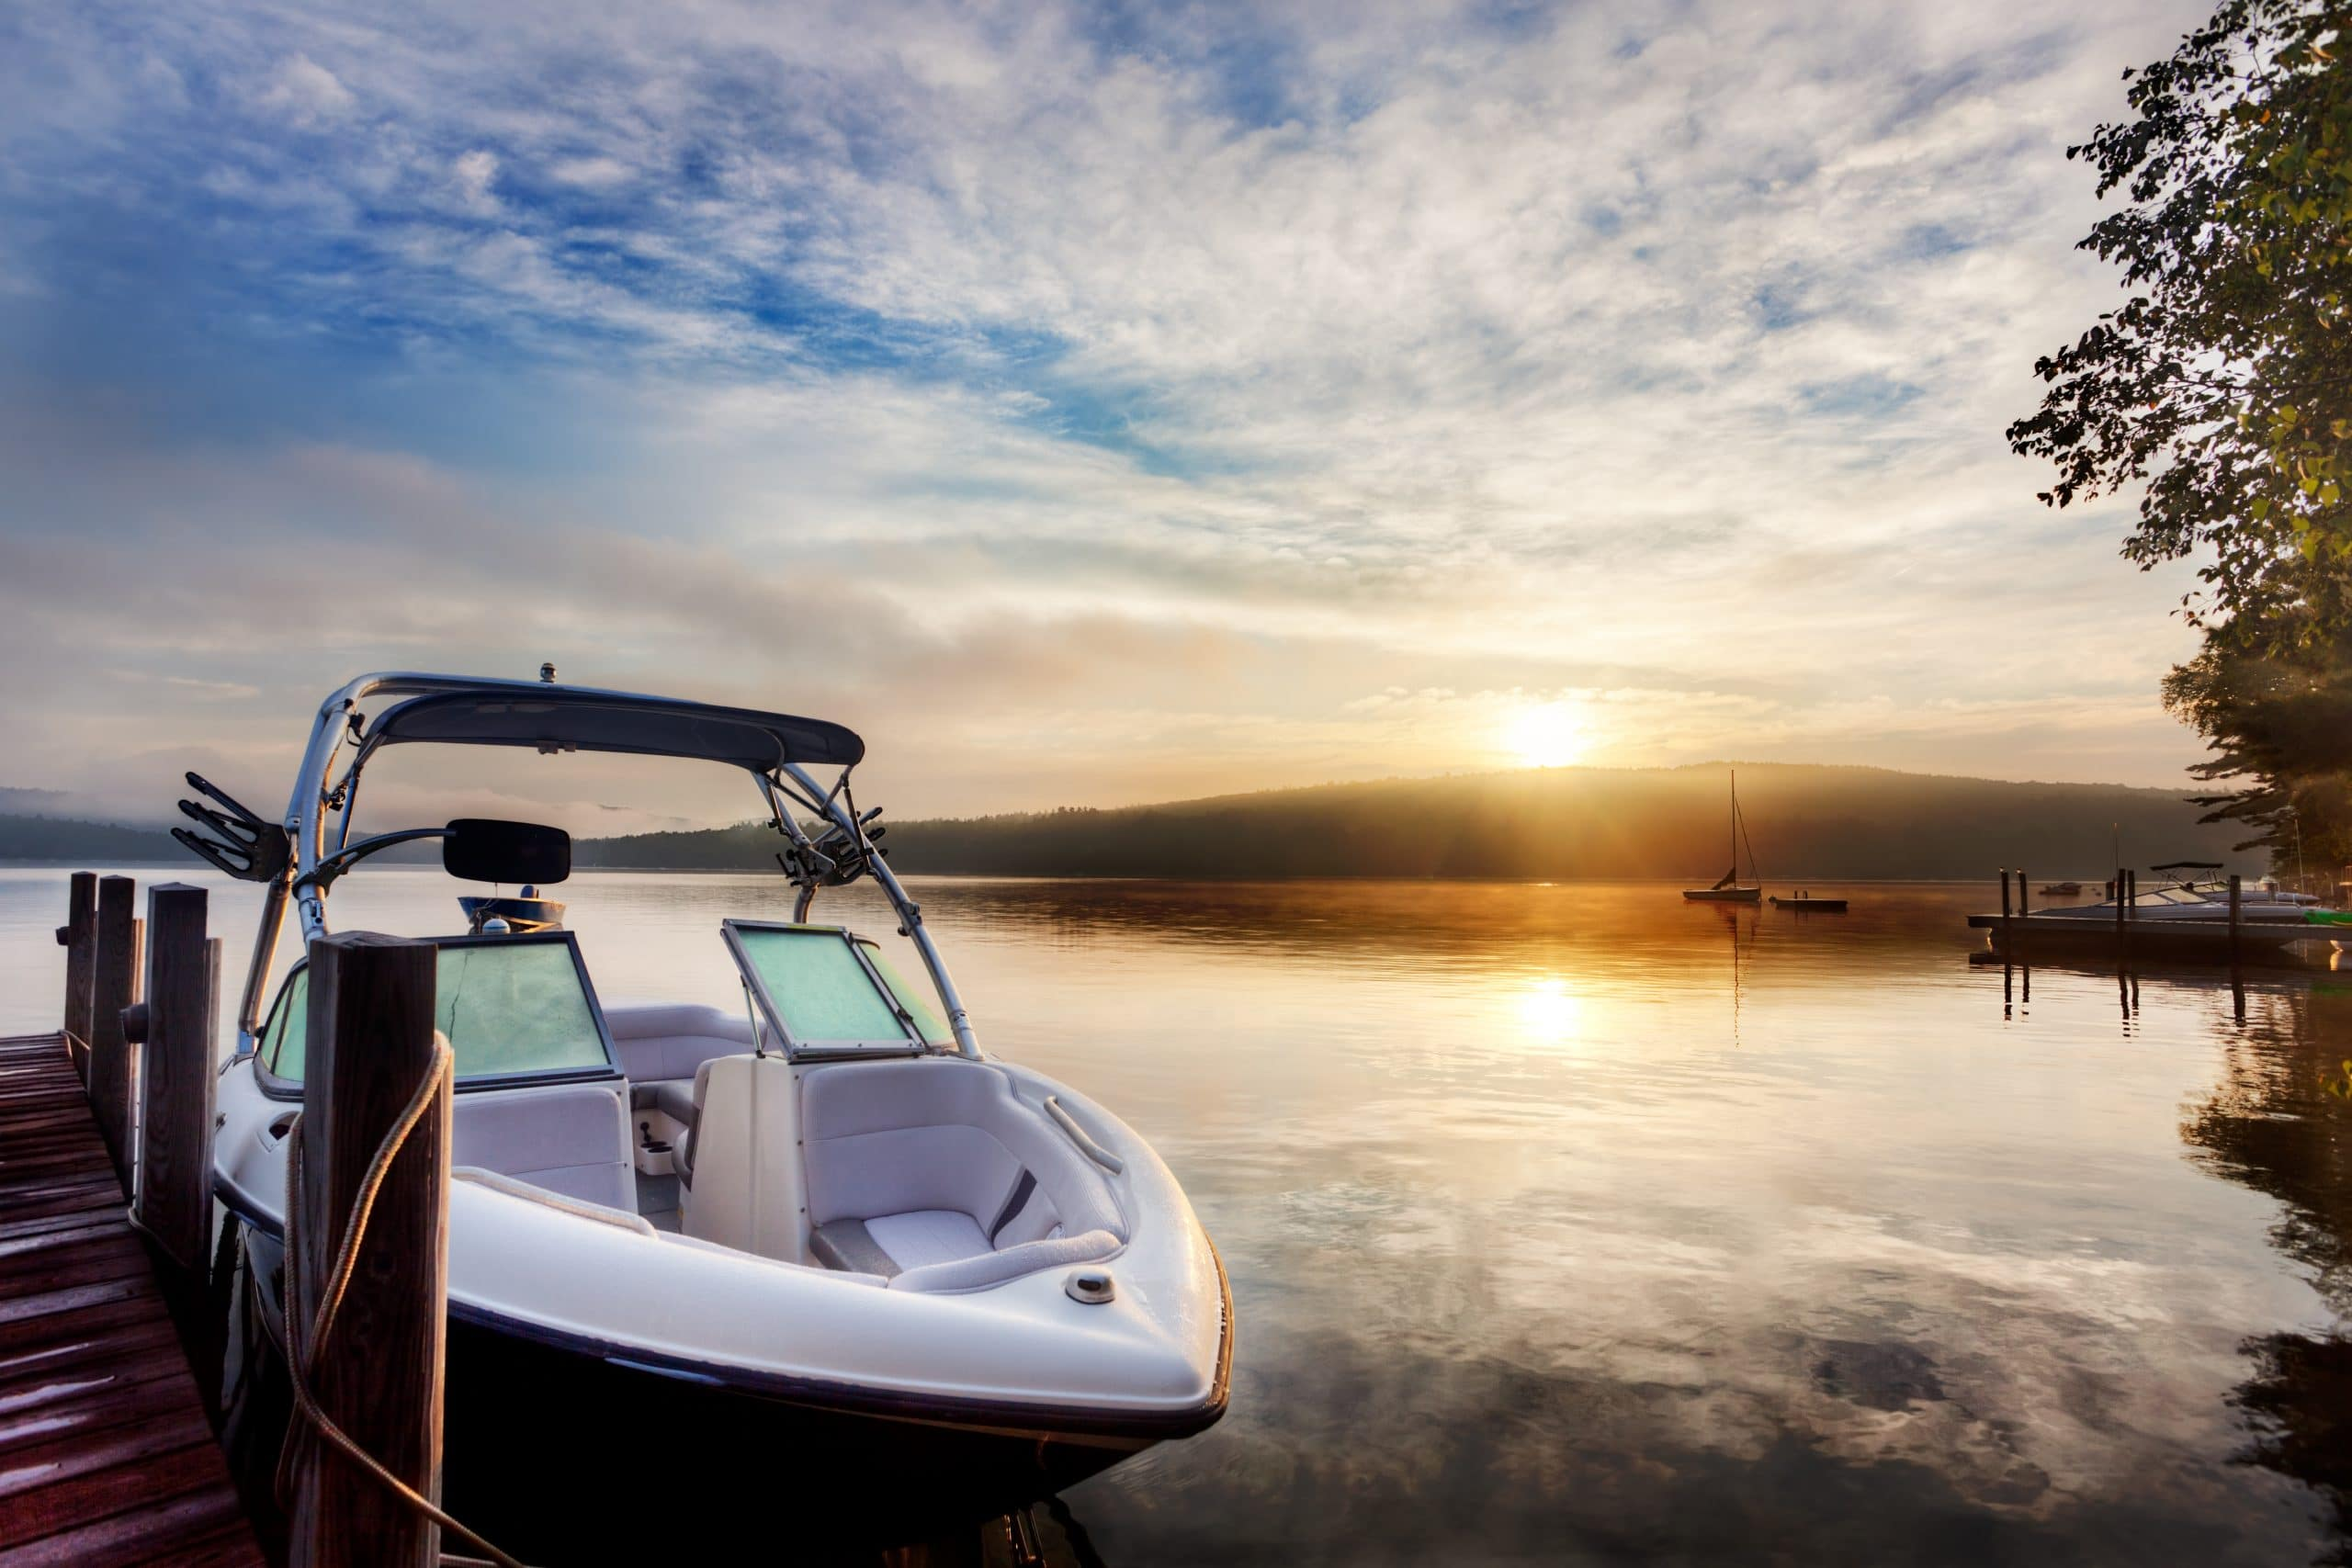 Lake boating